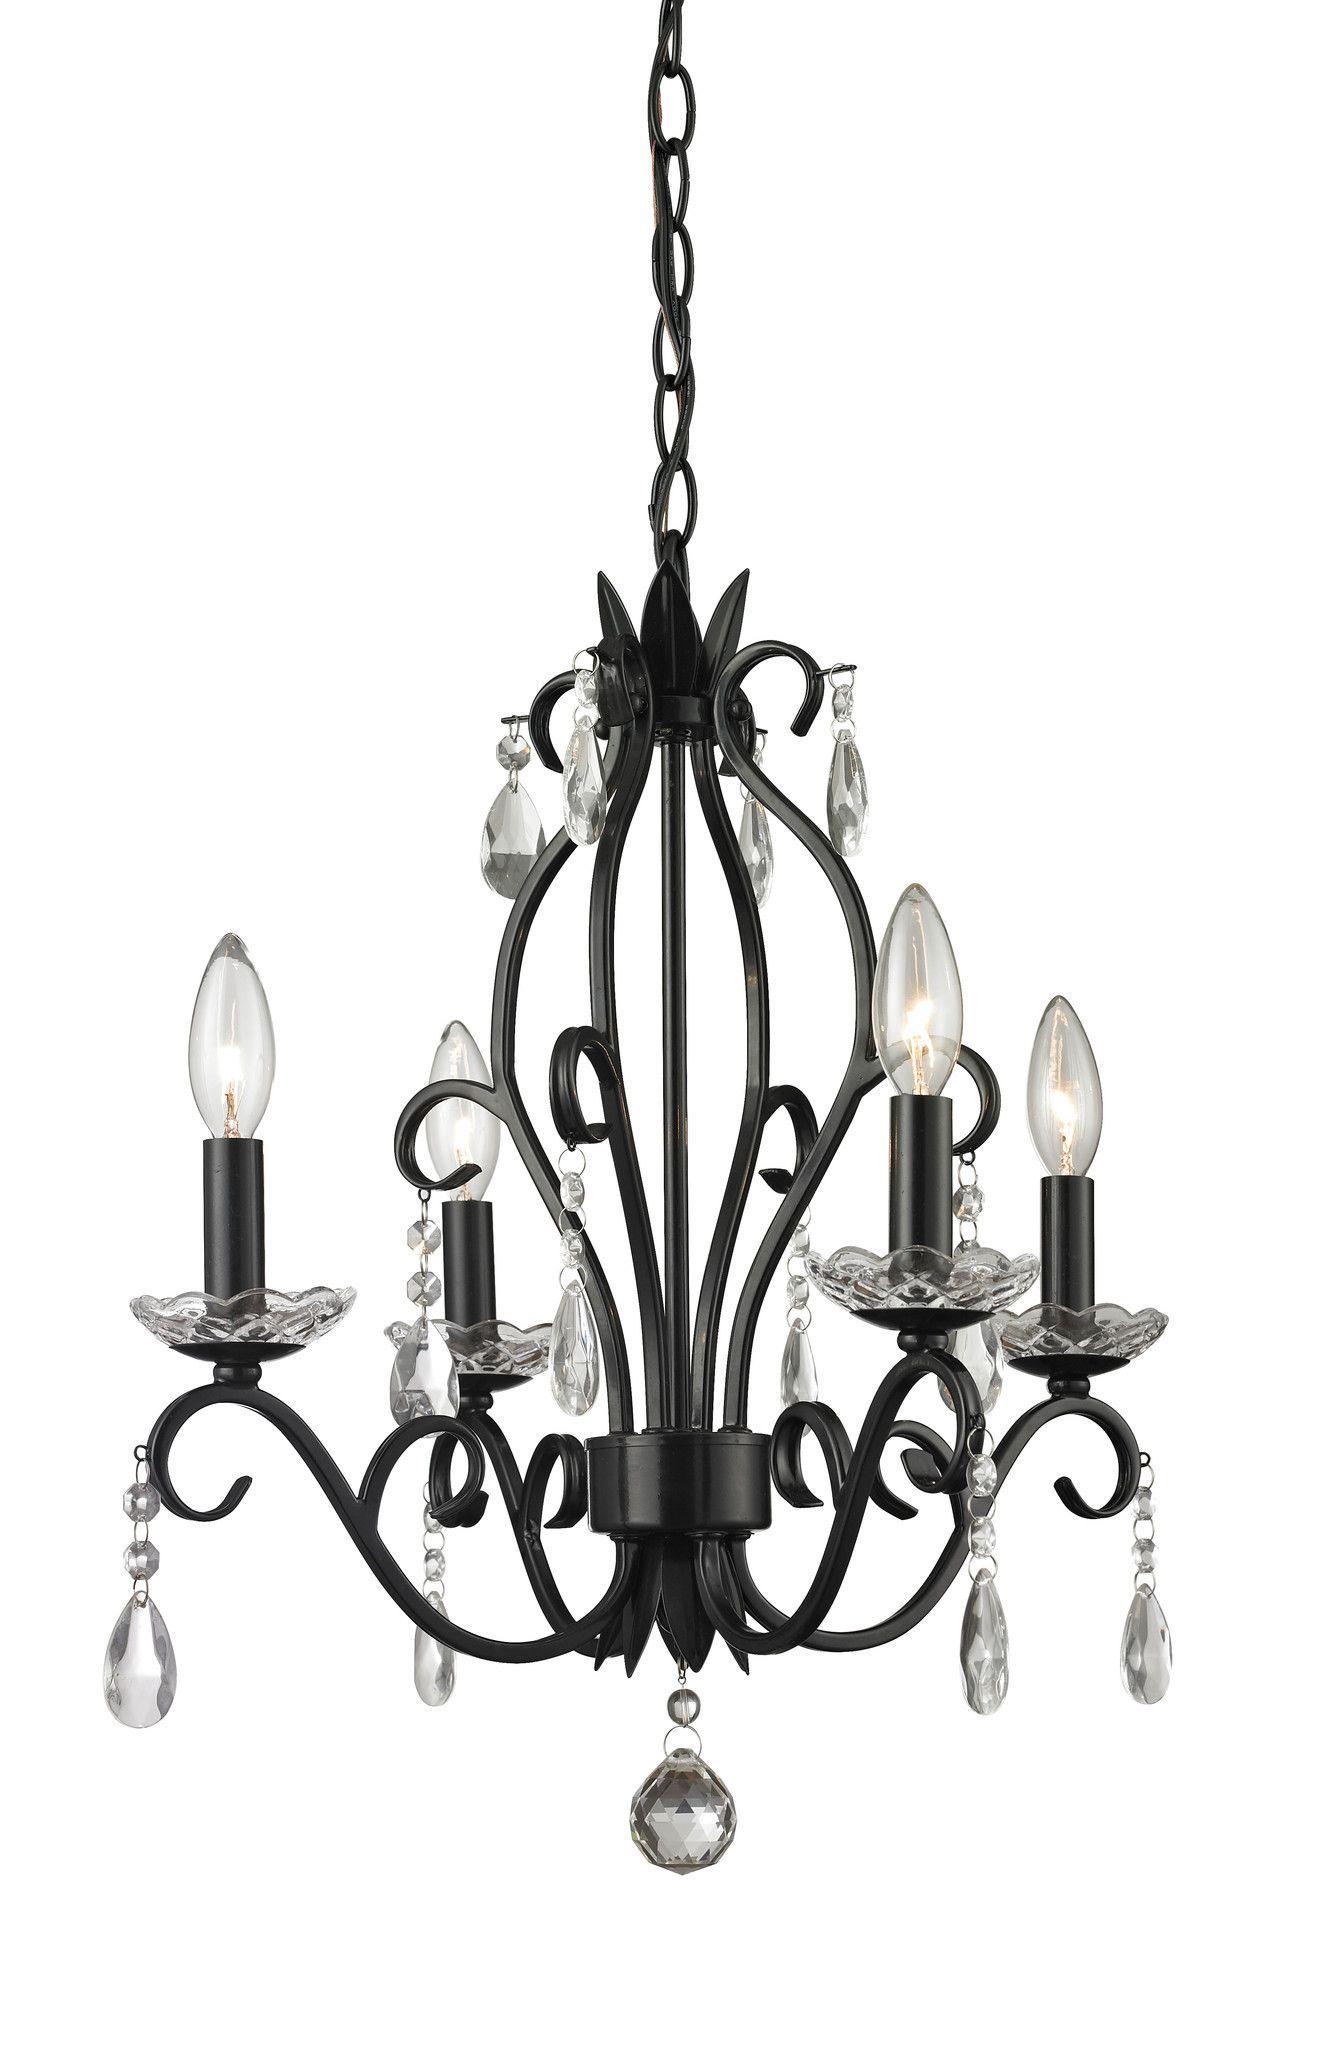 Z lite princess chandeliers 425mb mini chandelier light mini z lite princess chandeliers 425mb mini chandelier light arubaitofo Choice Image